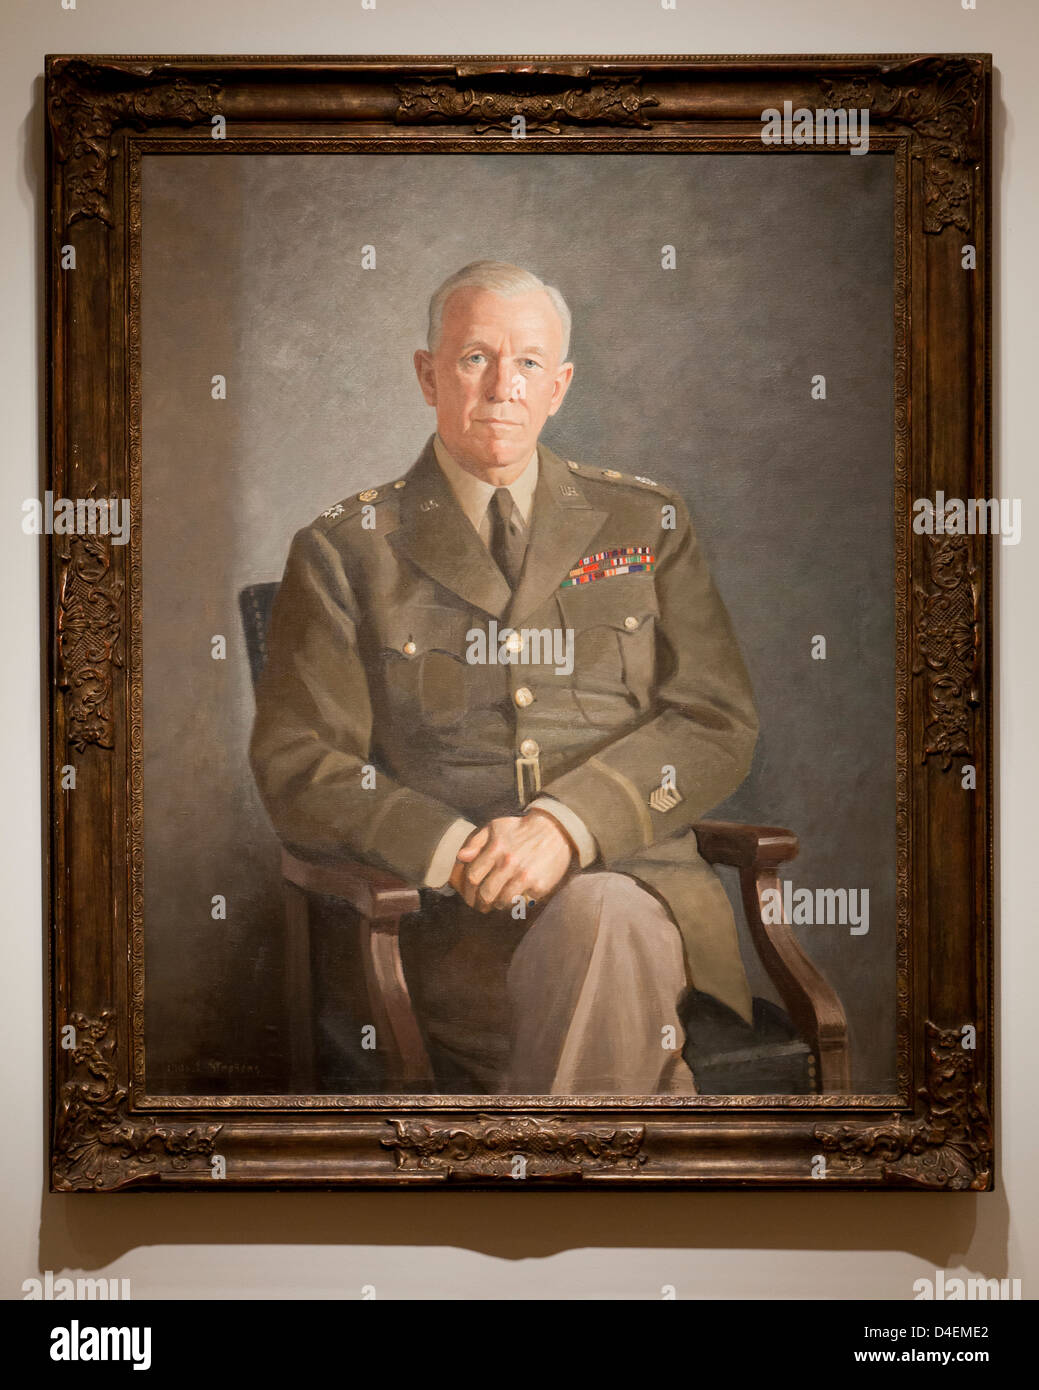 George C Marshall portrait by Thomas E Stephens, 1949 - Stock Image